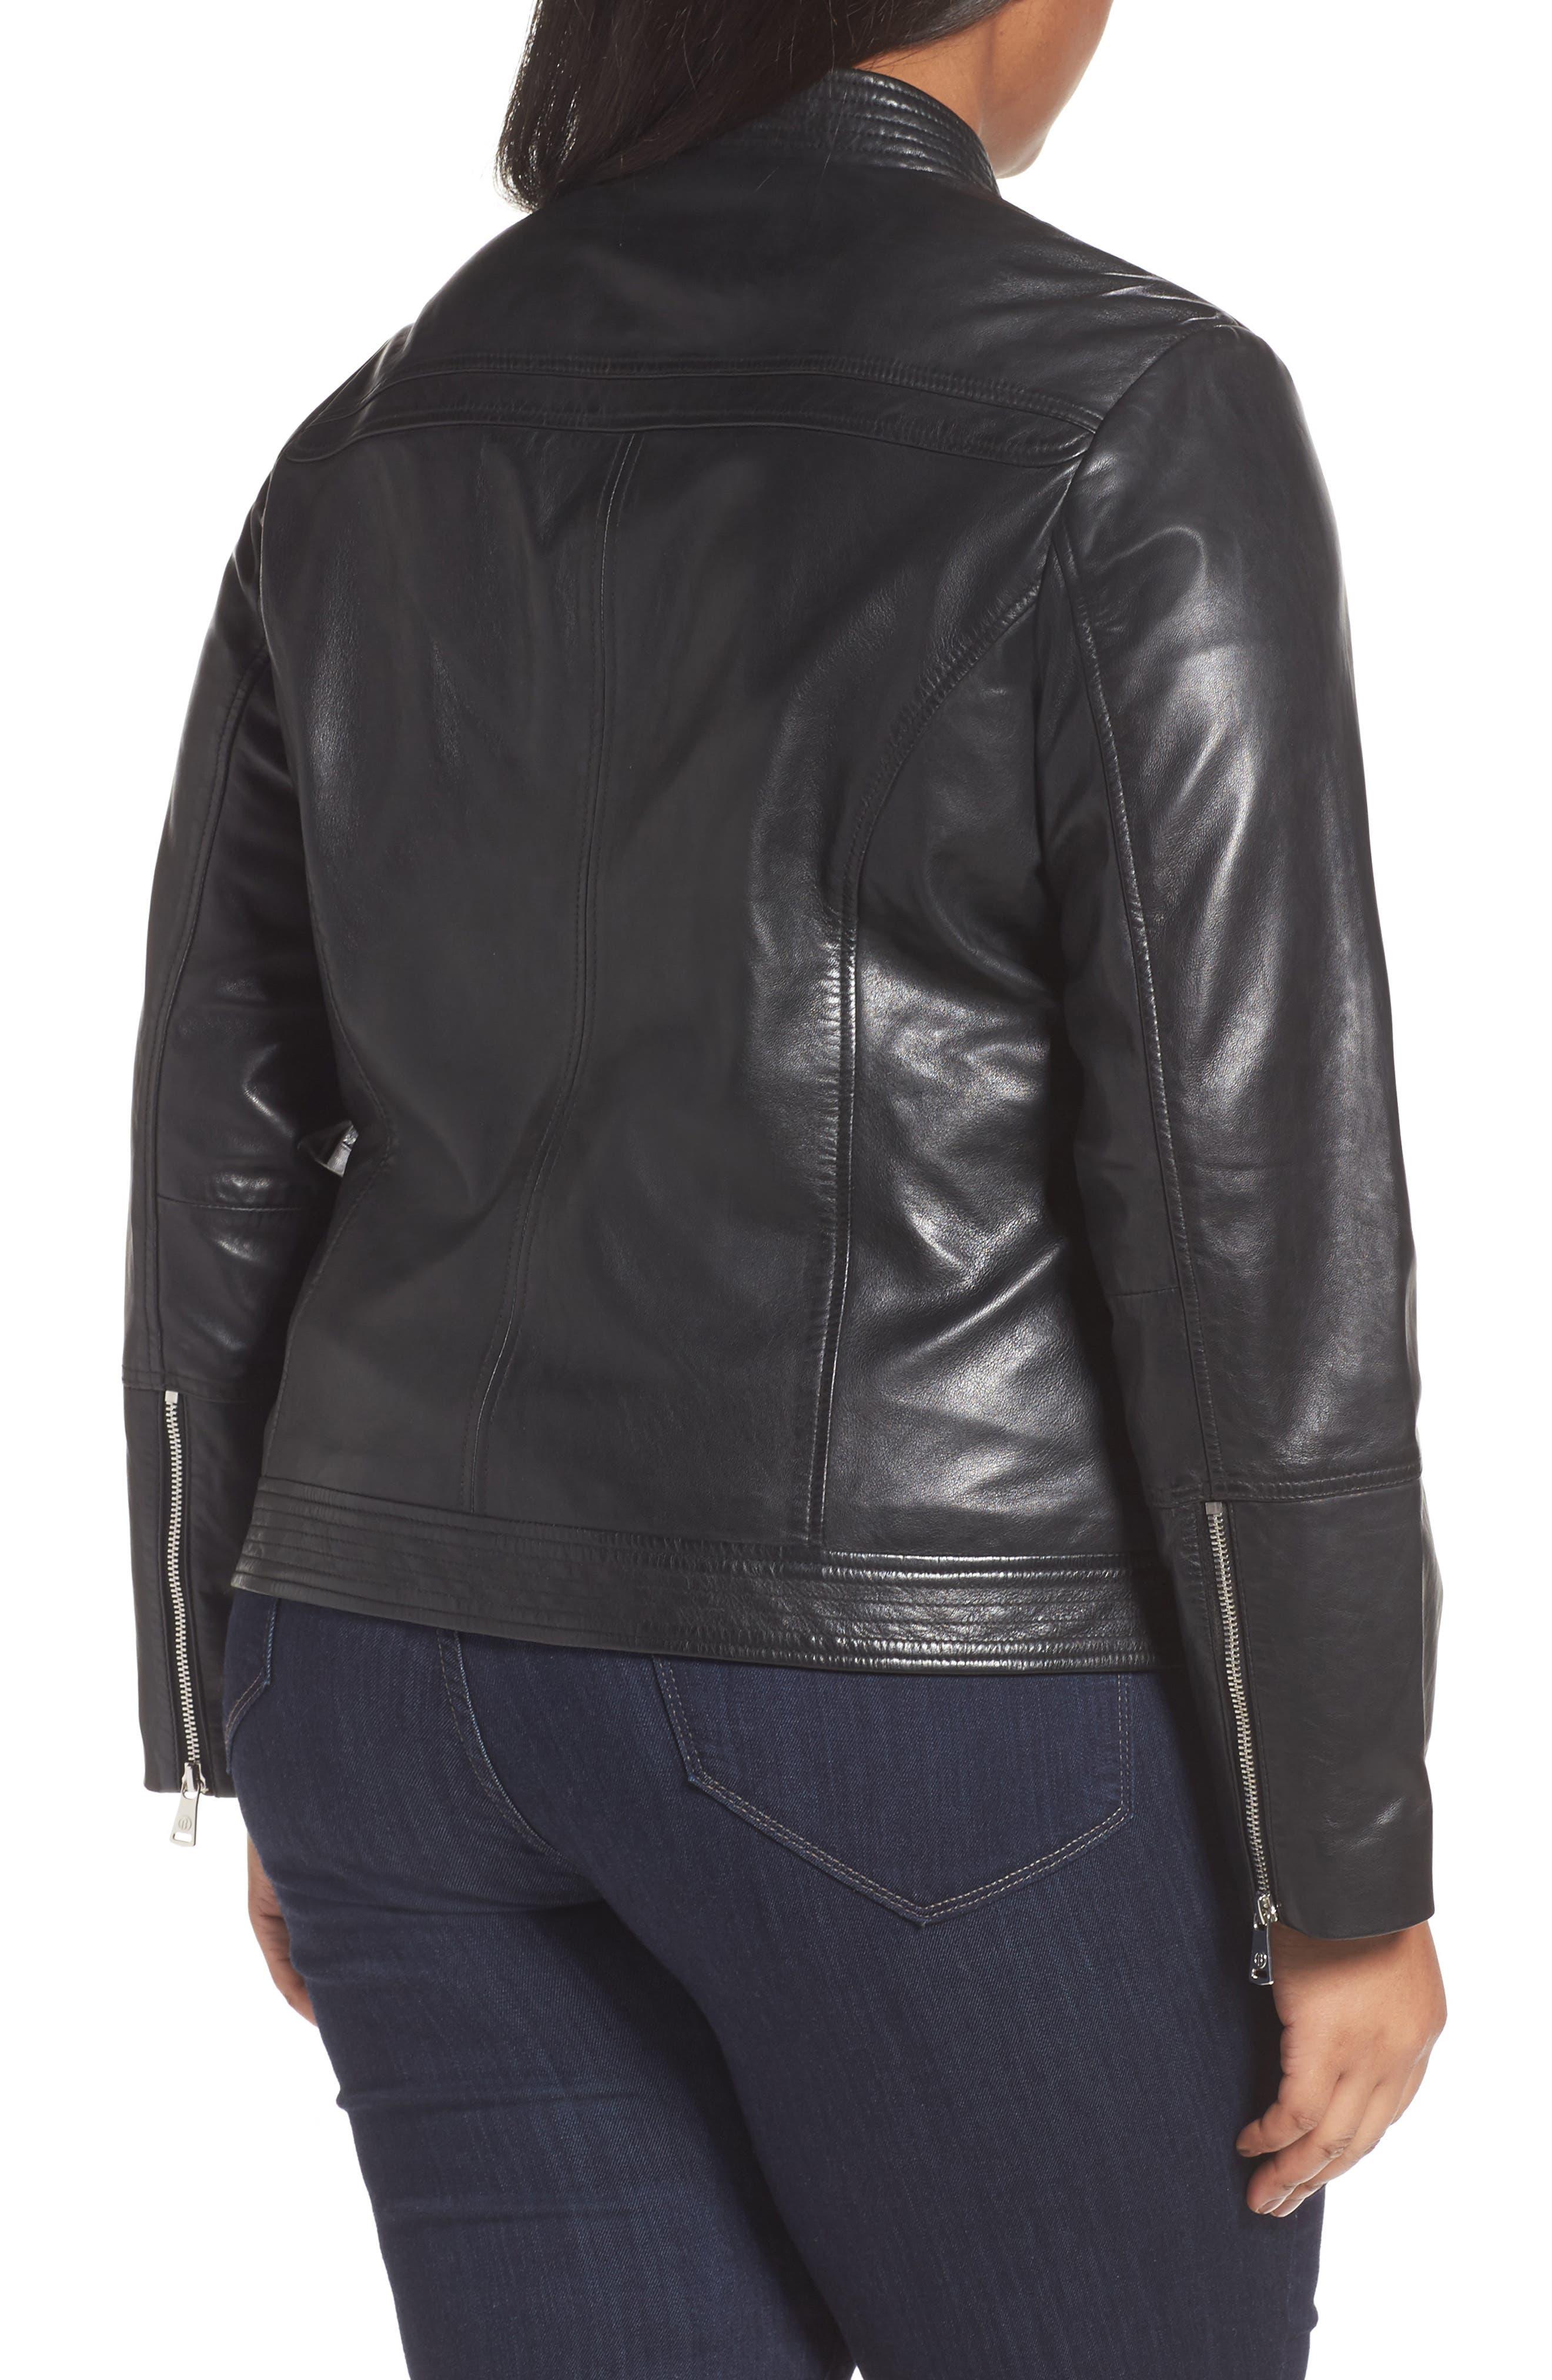 Kirwin Sheepskin Leather Jacket,                             Alternate thumbnail 2, color,                             001